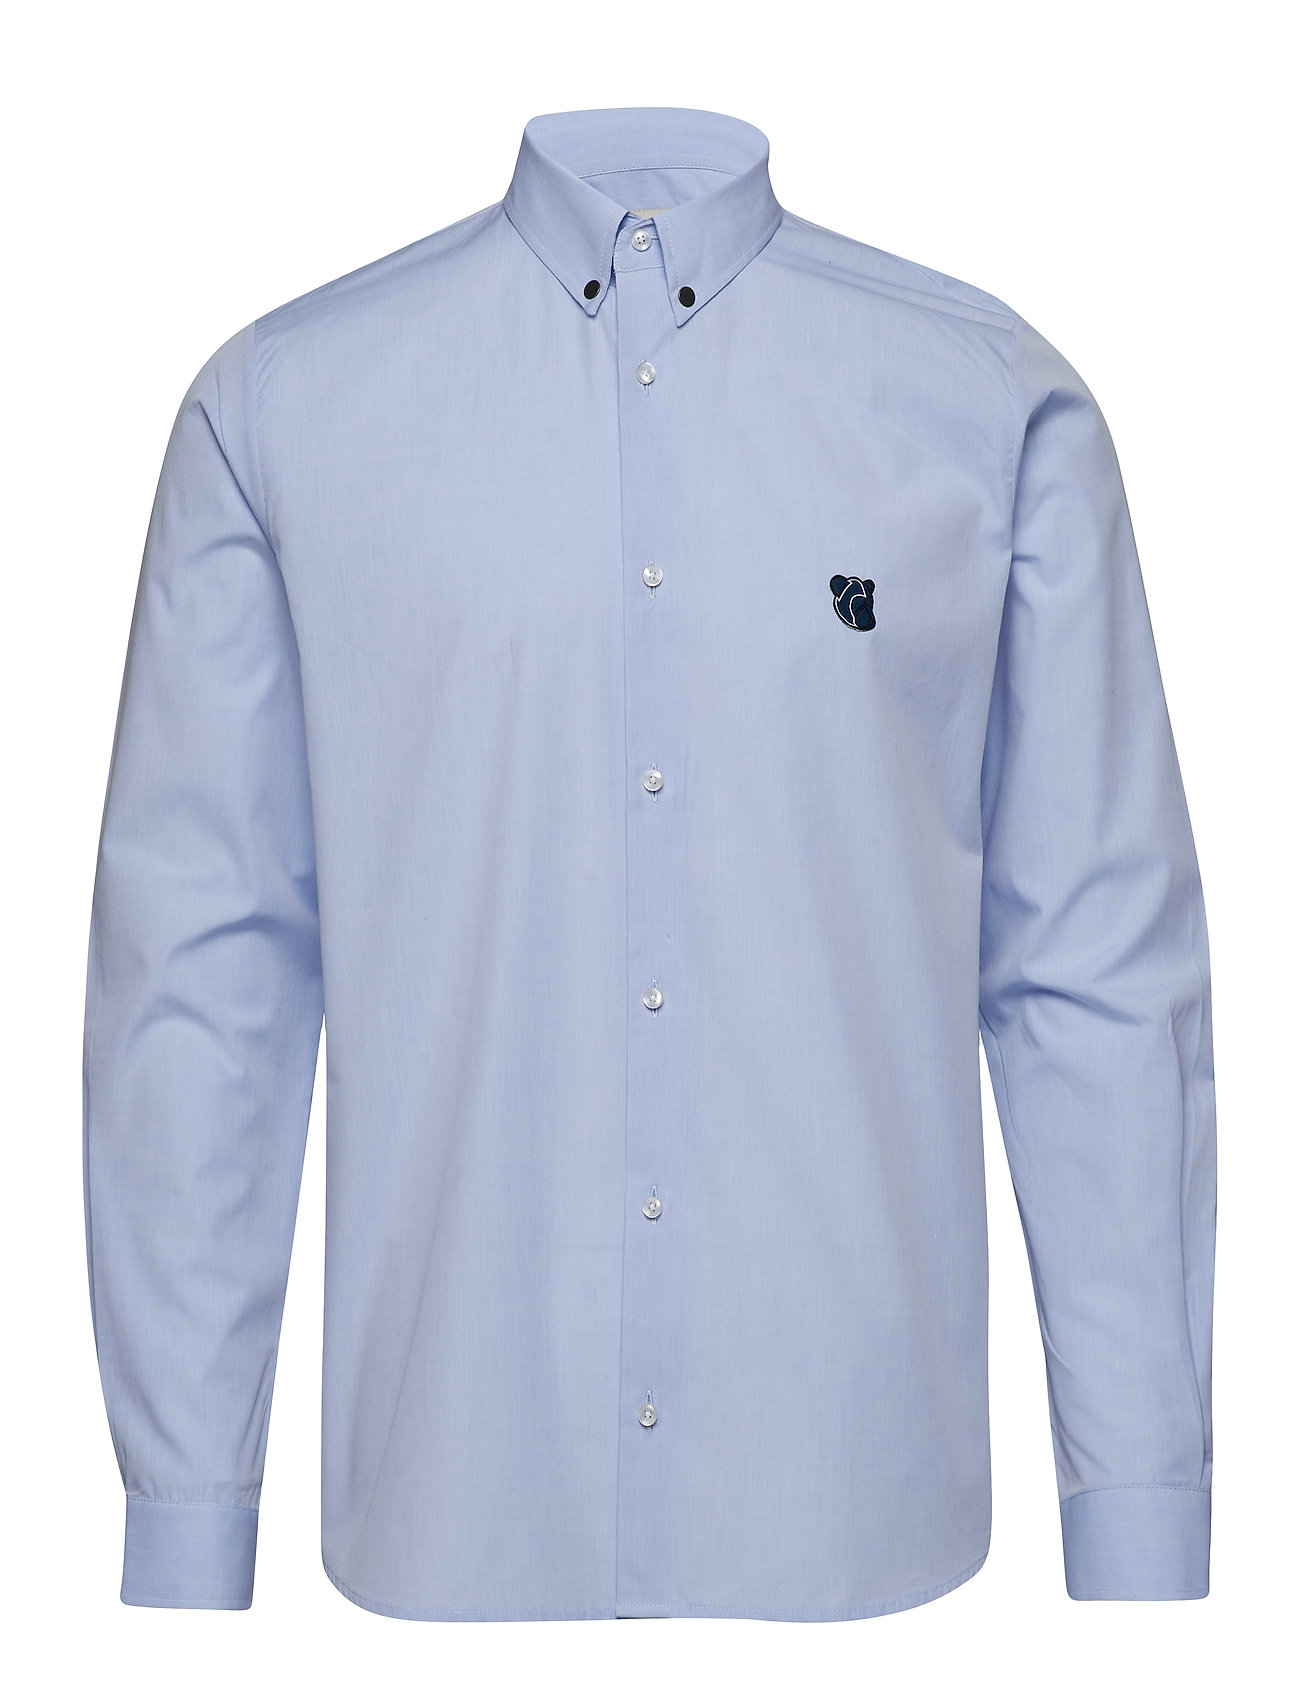 Tonsure Regular shirt with embroidered logo - LIGHT BLUE